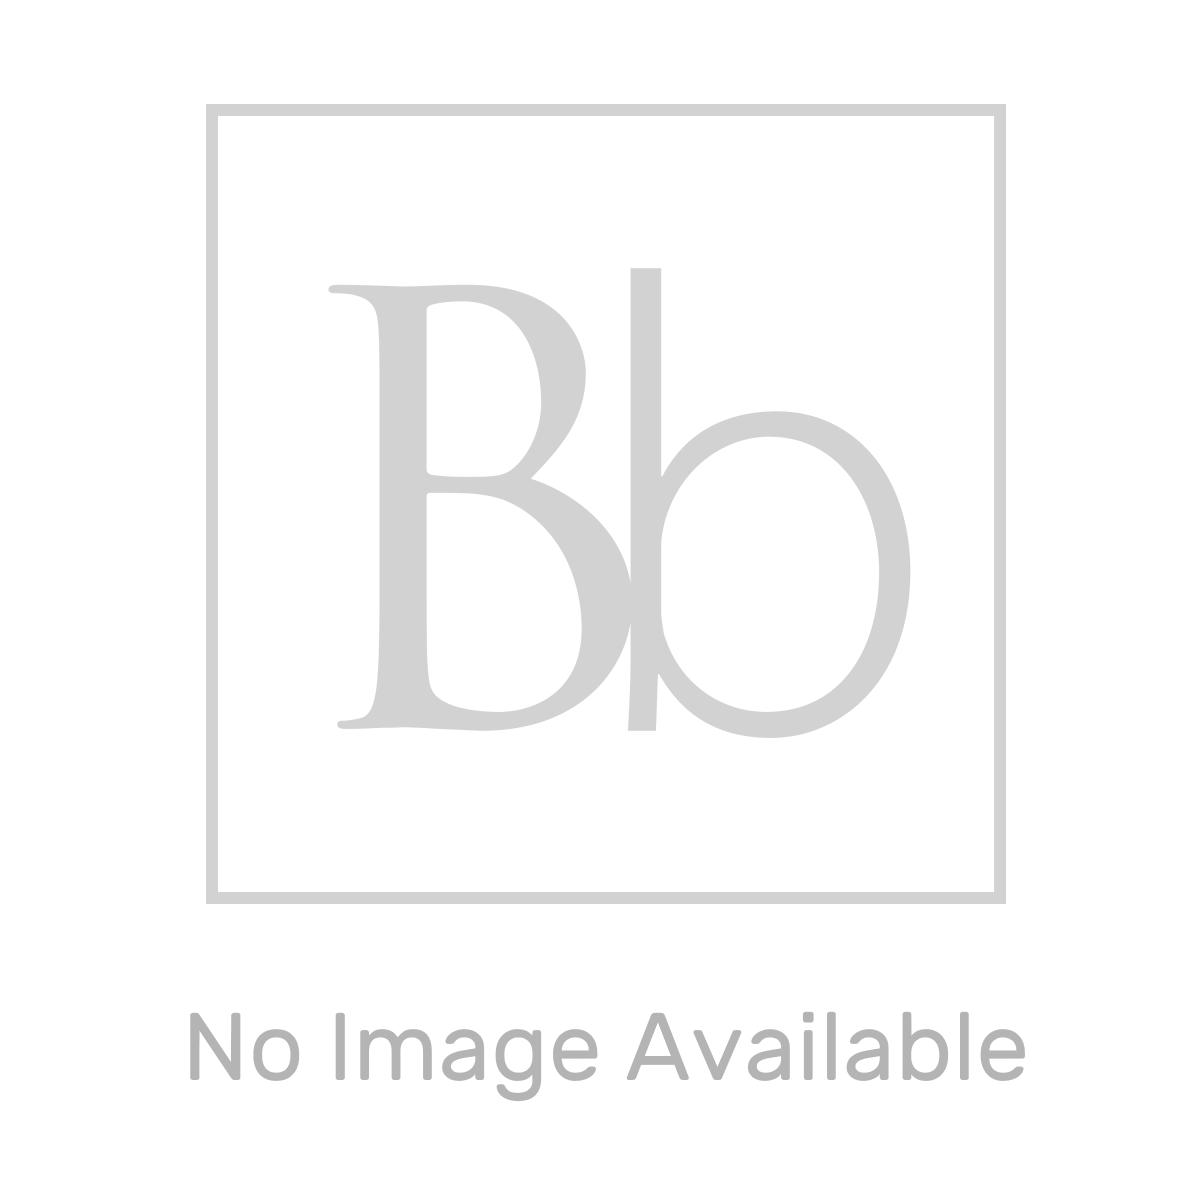 Stuart Turner 46631 Mainsboost Flomate MBF 60 3.2 Bar Pump